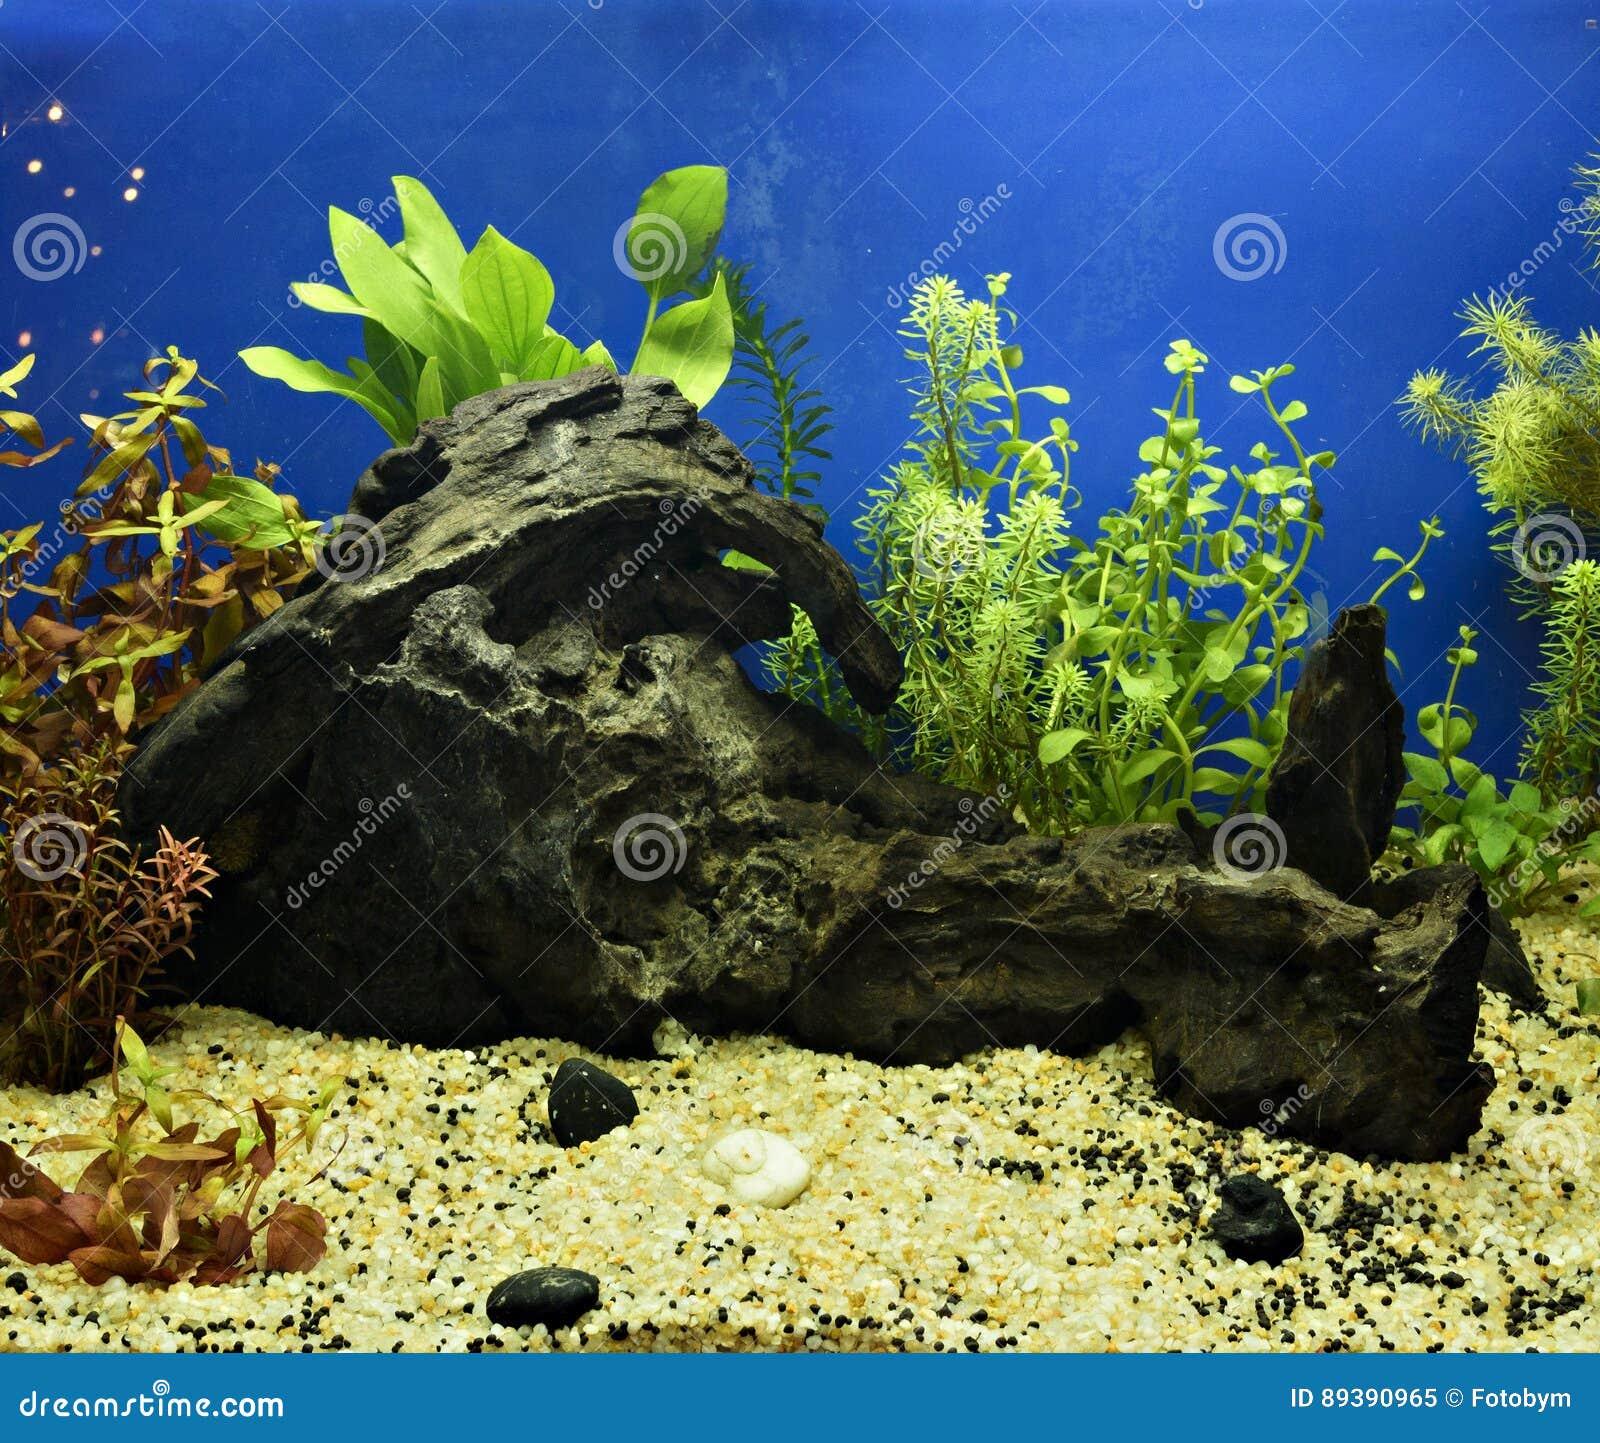 Aquascaping Of The Planted Aquarium Stock Image Image Of Aquascaping Fresh 89390965